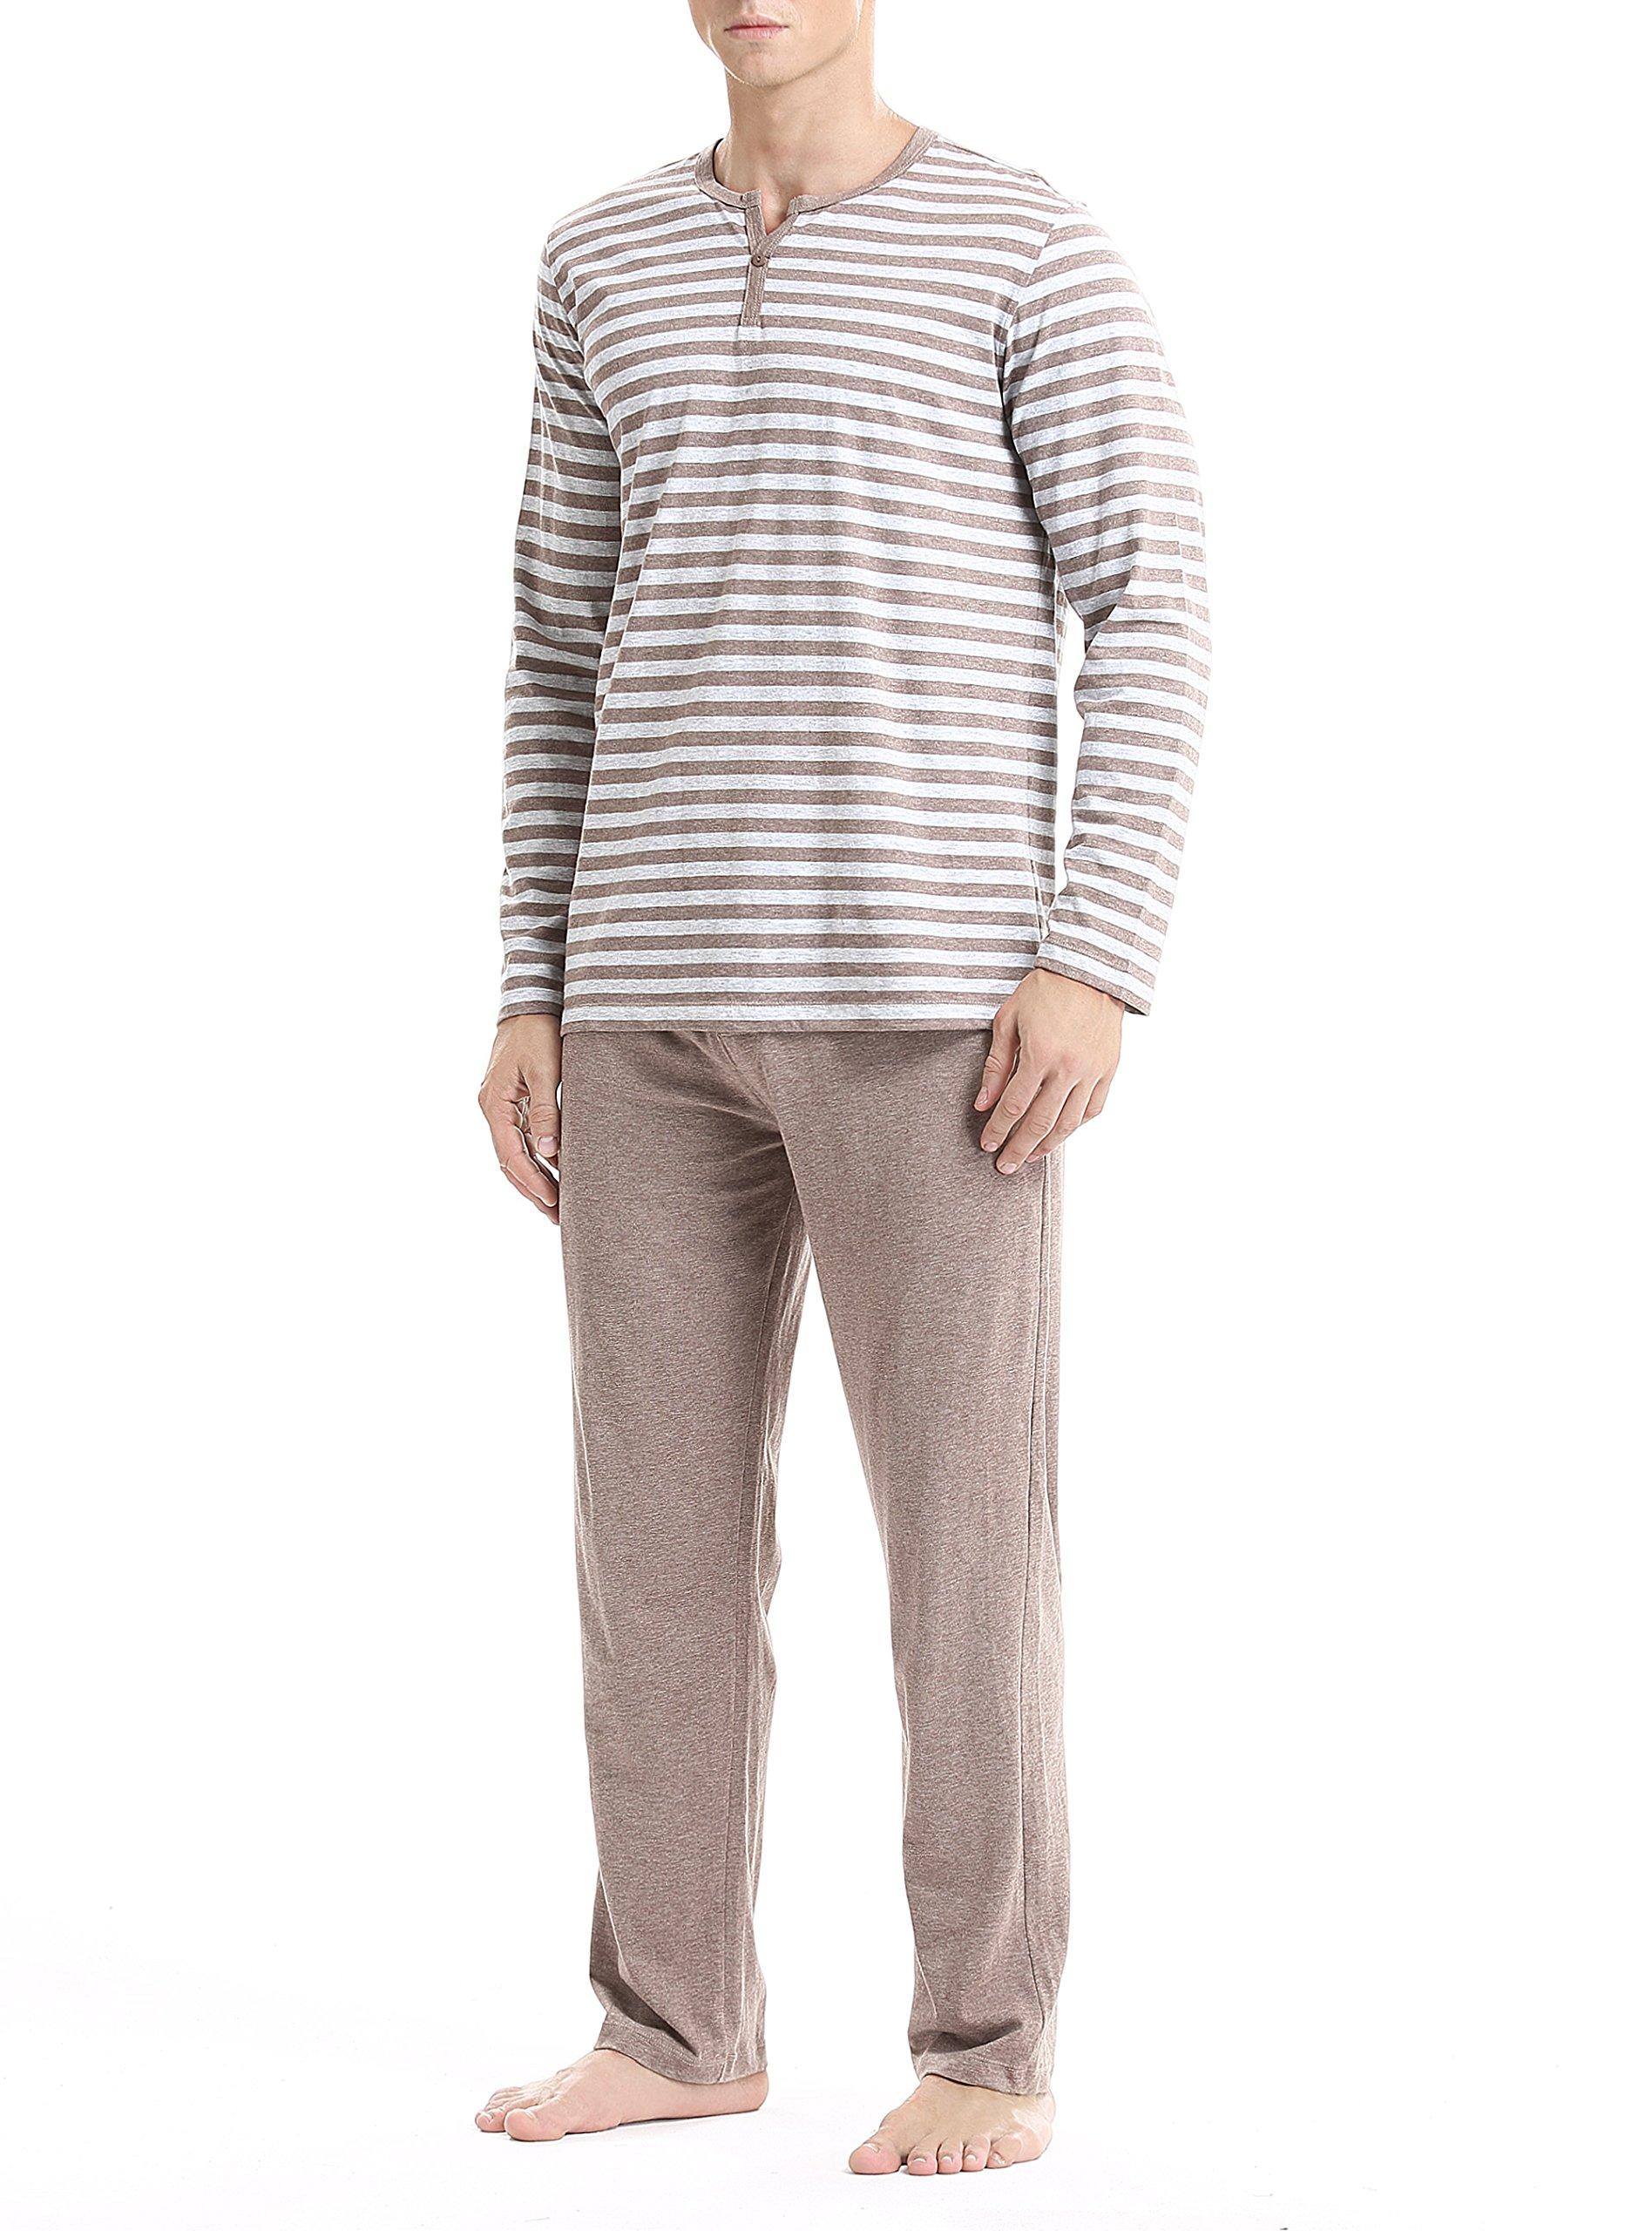 David Archy Men's Cotton Heather Striped Sleepwear Long Sleeve Top & Bottom Pajama Set (Heather Dark Coffee, L)